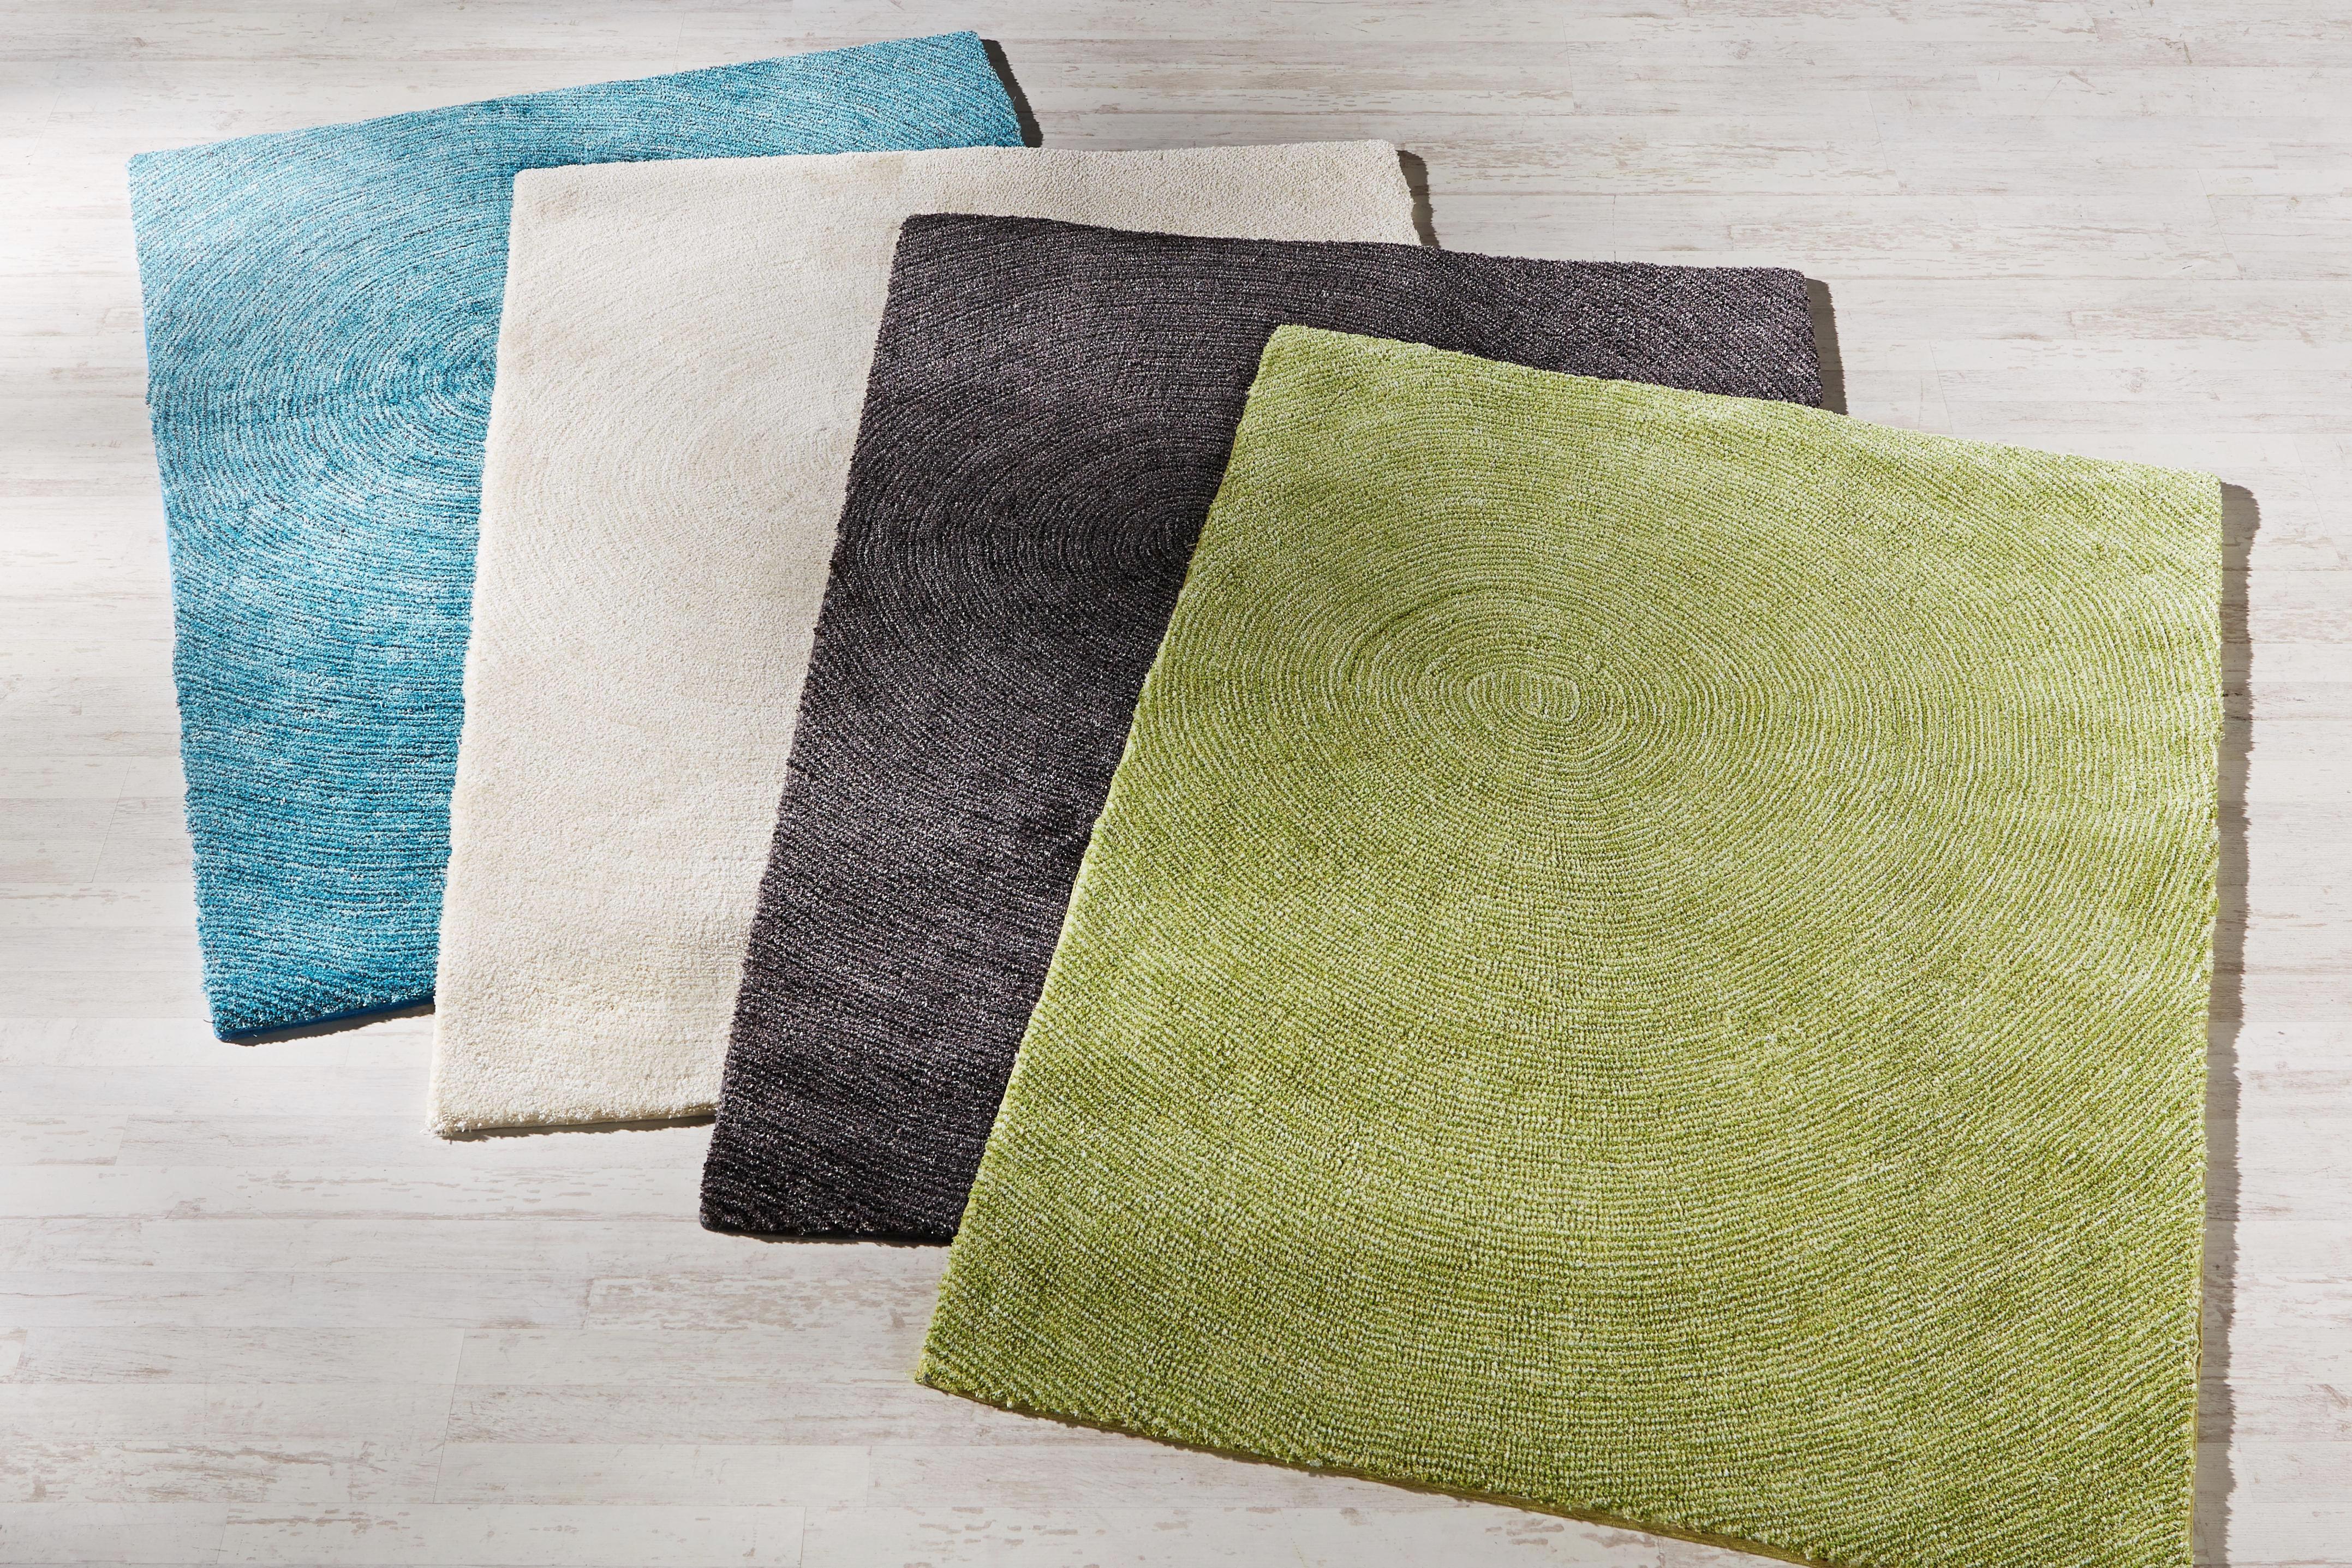 Tuftteppich Marcel - Grün, MODERN, Textil (120/170cm) - MÖMAX modern living